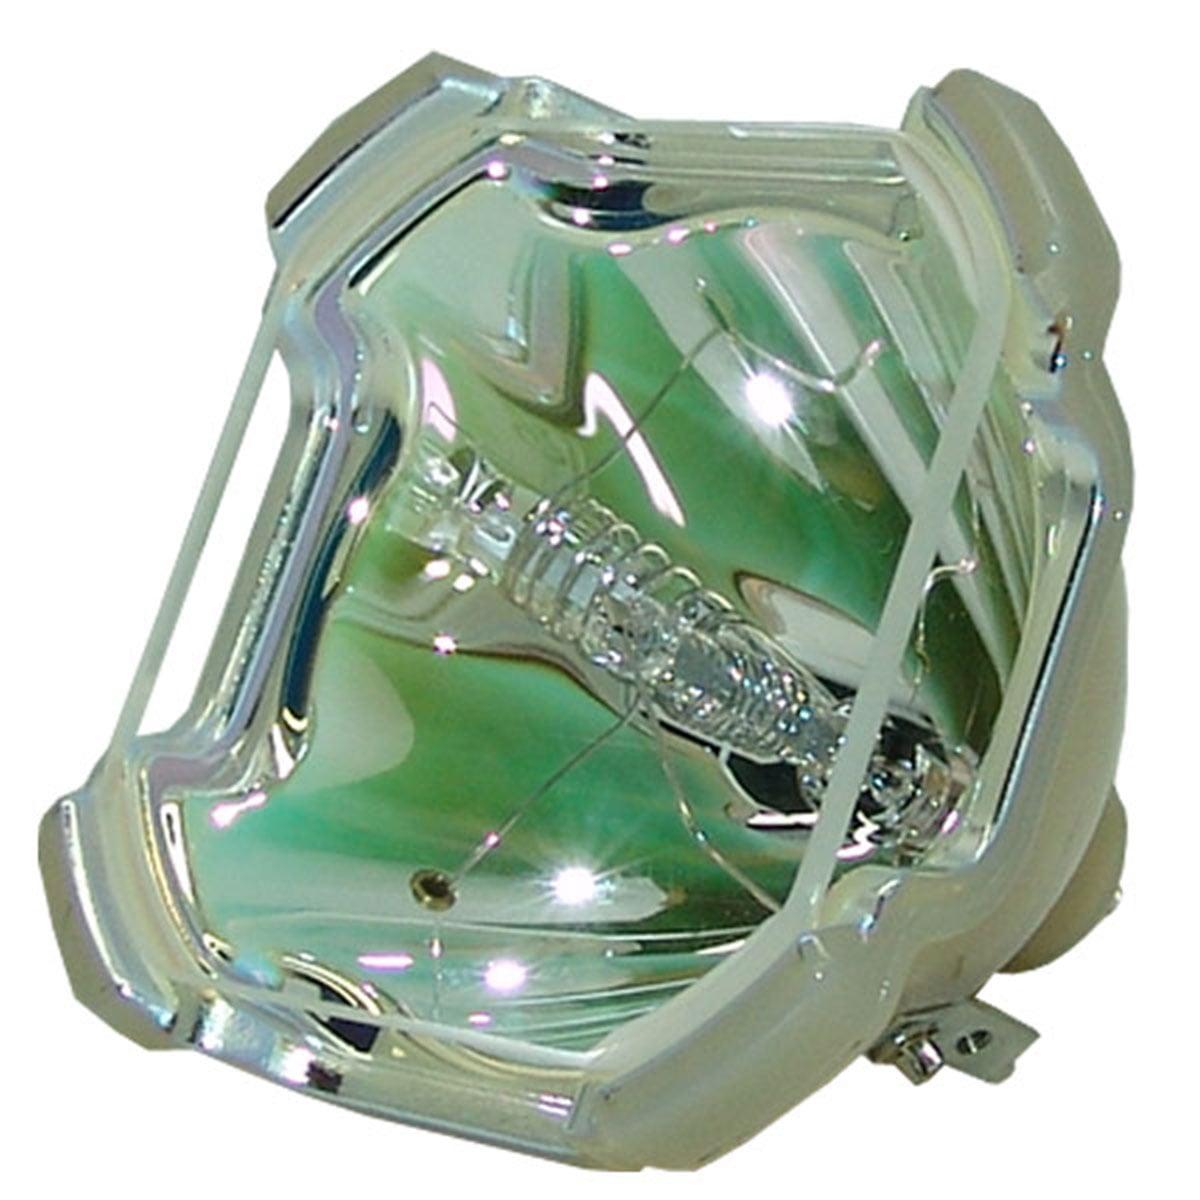 Osram Bare Lamp For Sanyo PLC-XT15KS / PLCXT15KS Projector DLP LCD Bulb